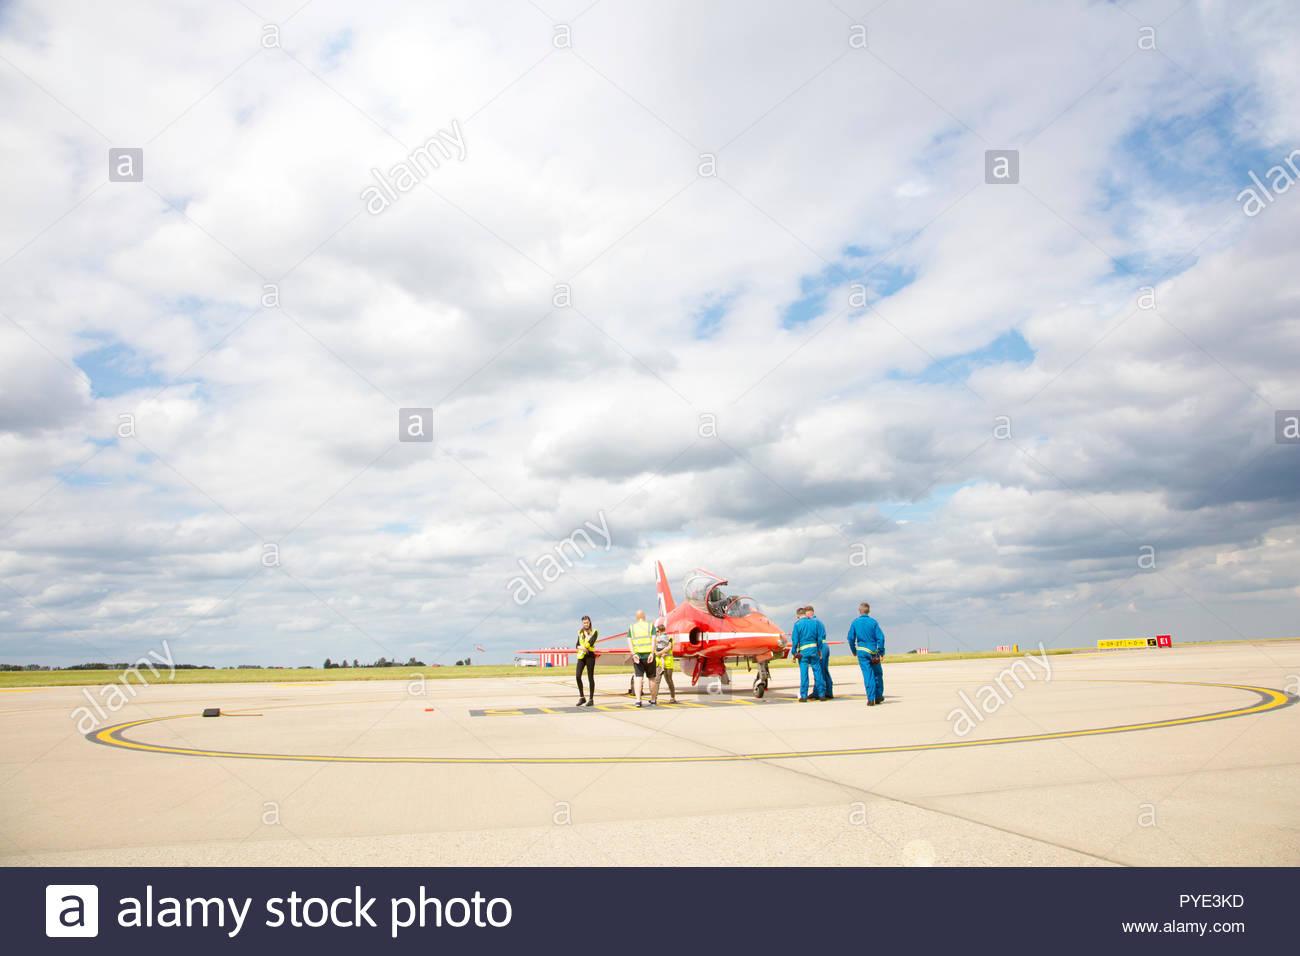 People by Red Arrows airplane on RAF Scrampton, UK - Stock Image